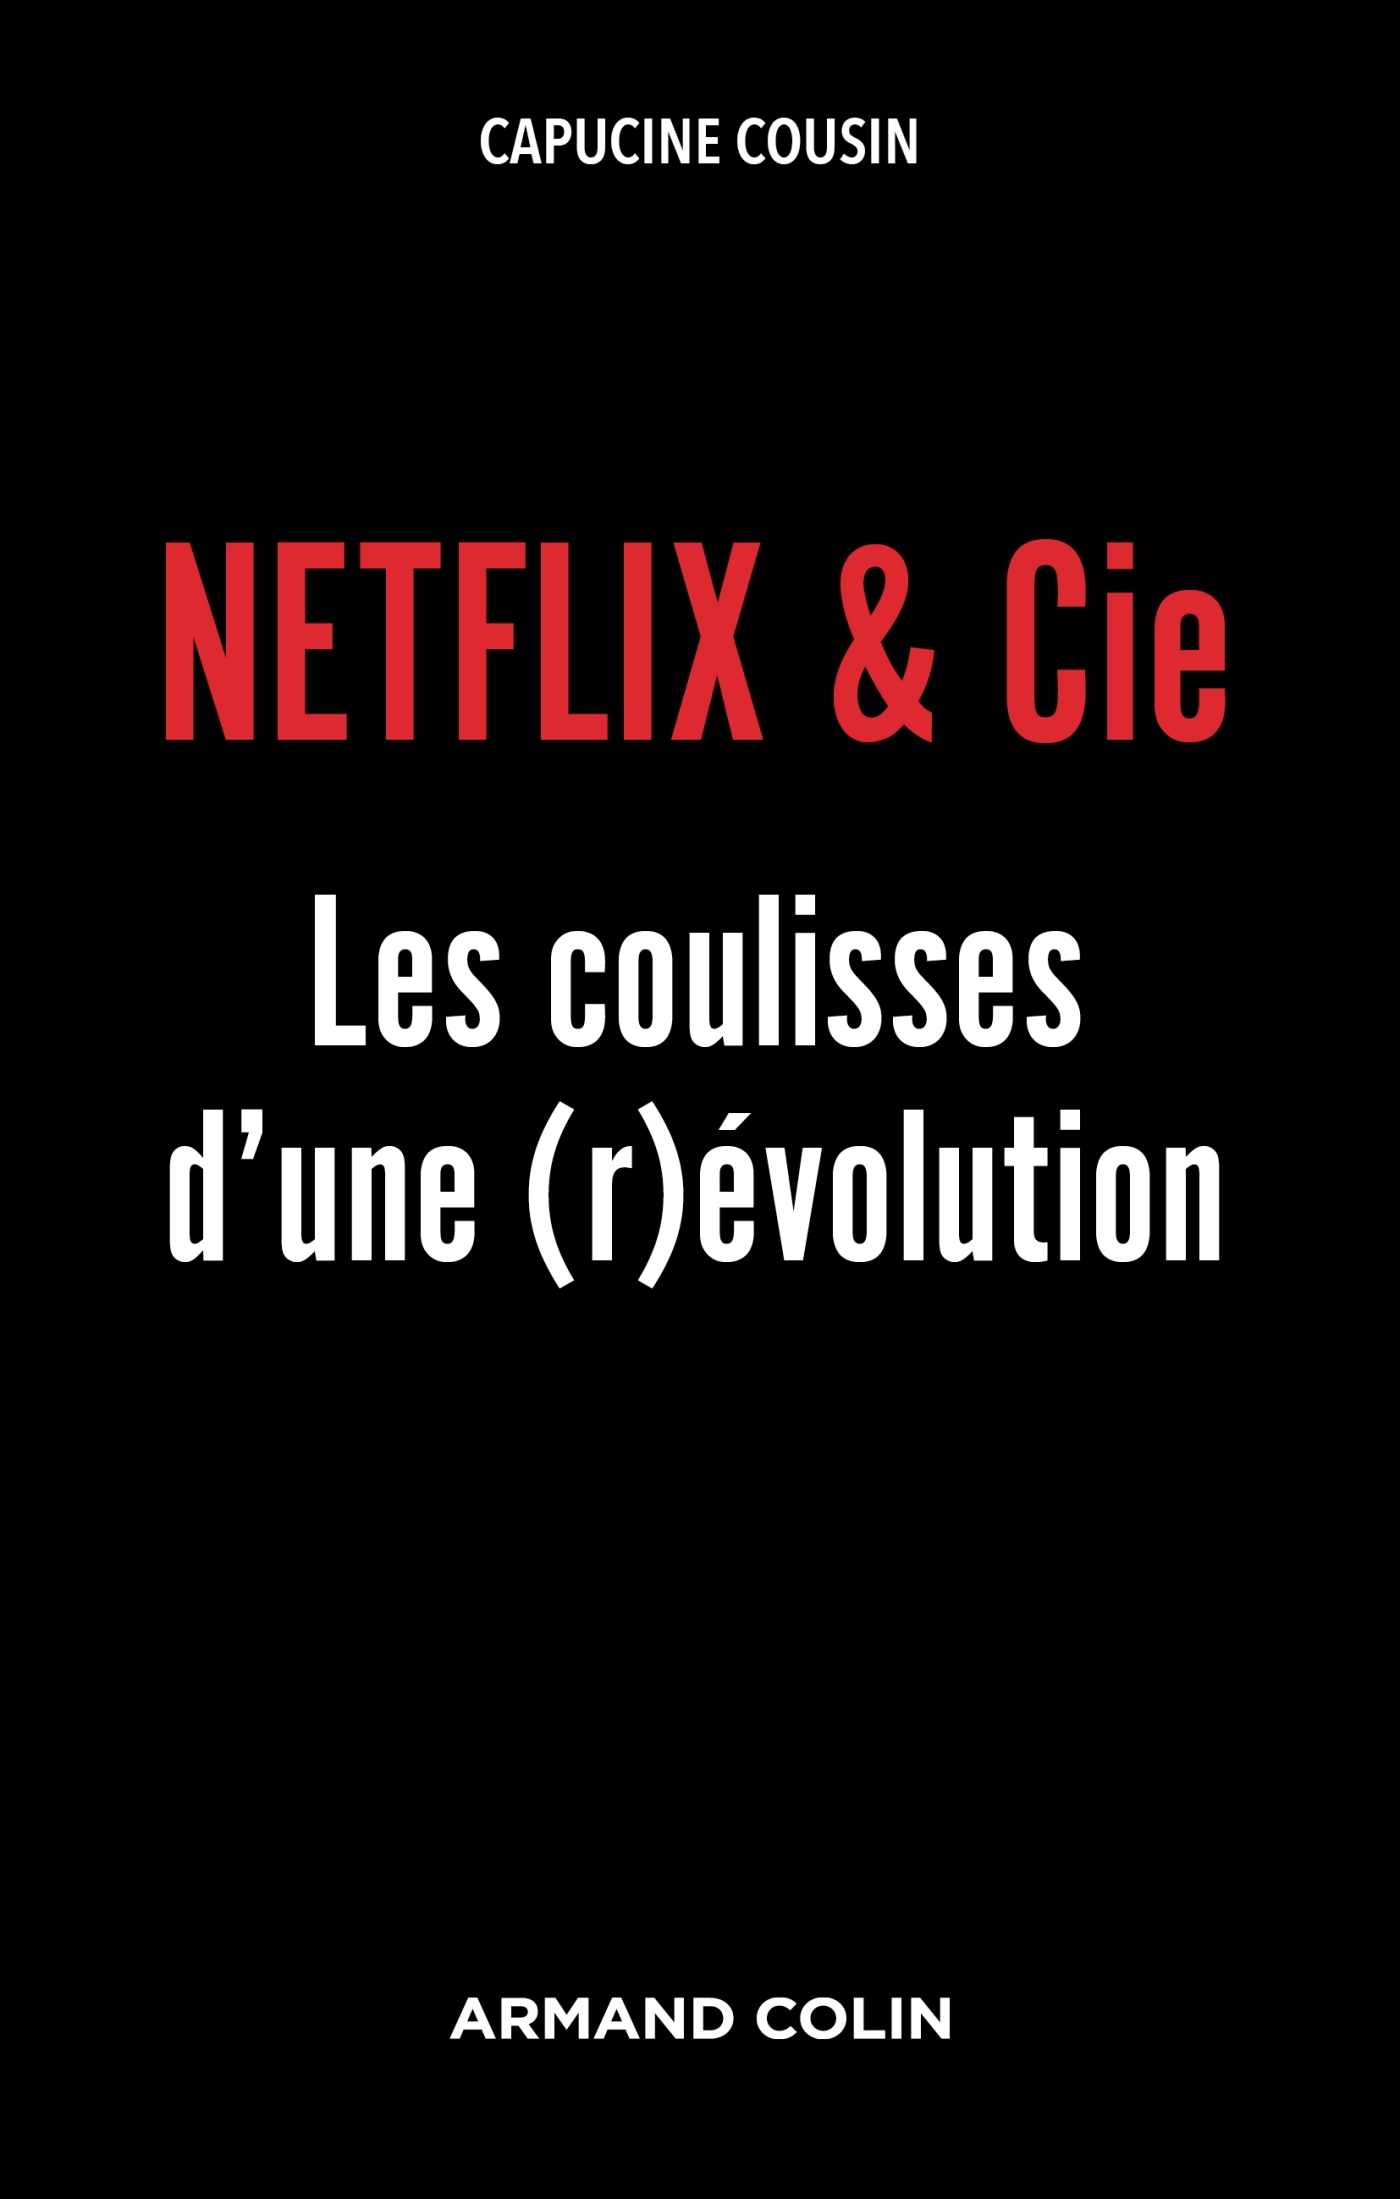 Netflix & Cie